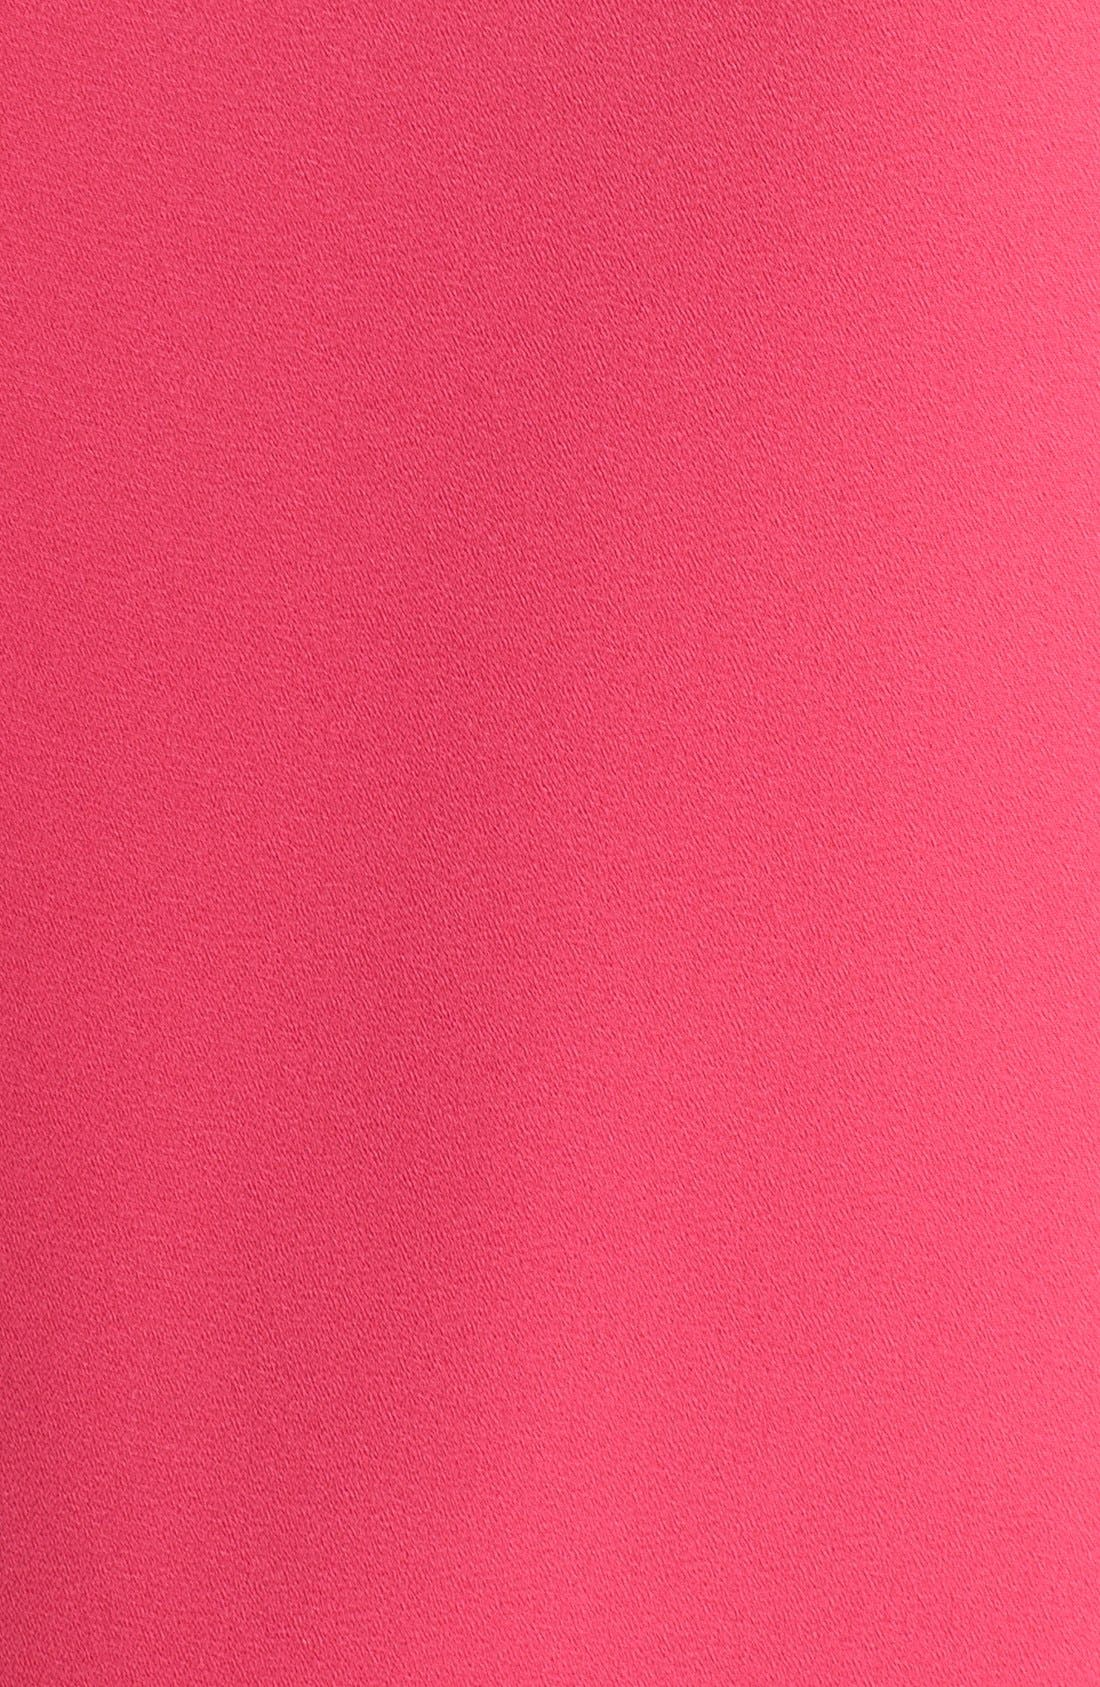 VINCE CAMUTO, Cold Shoulder Shift Dress, Alternate thumbnail 4, color, 660